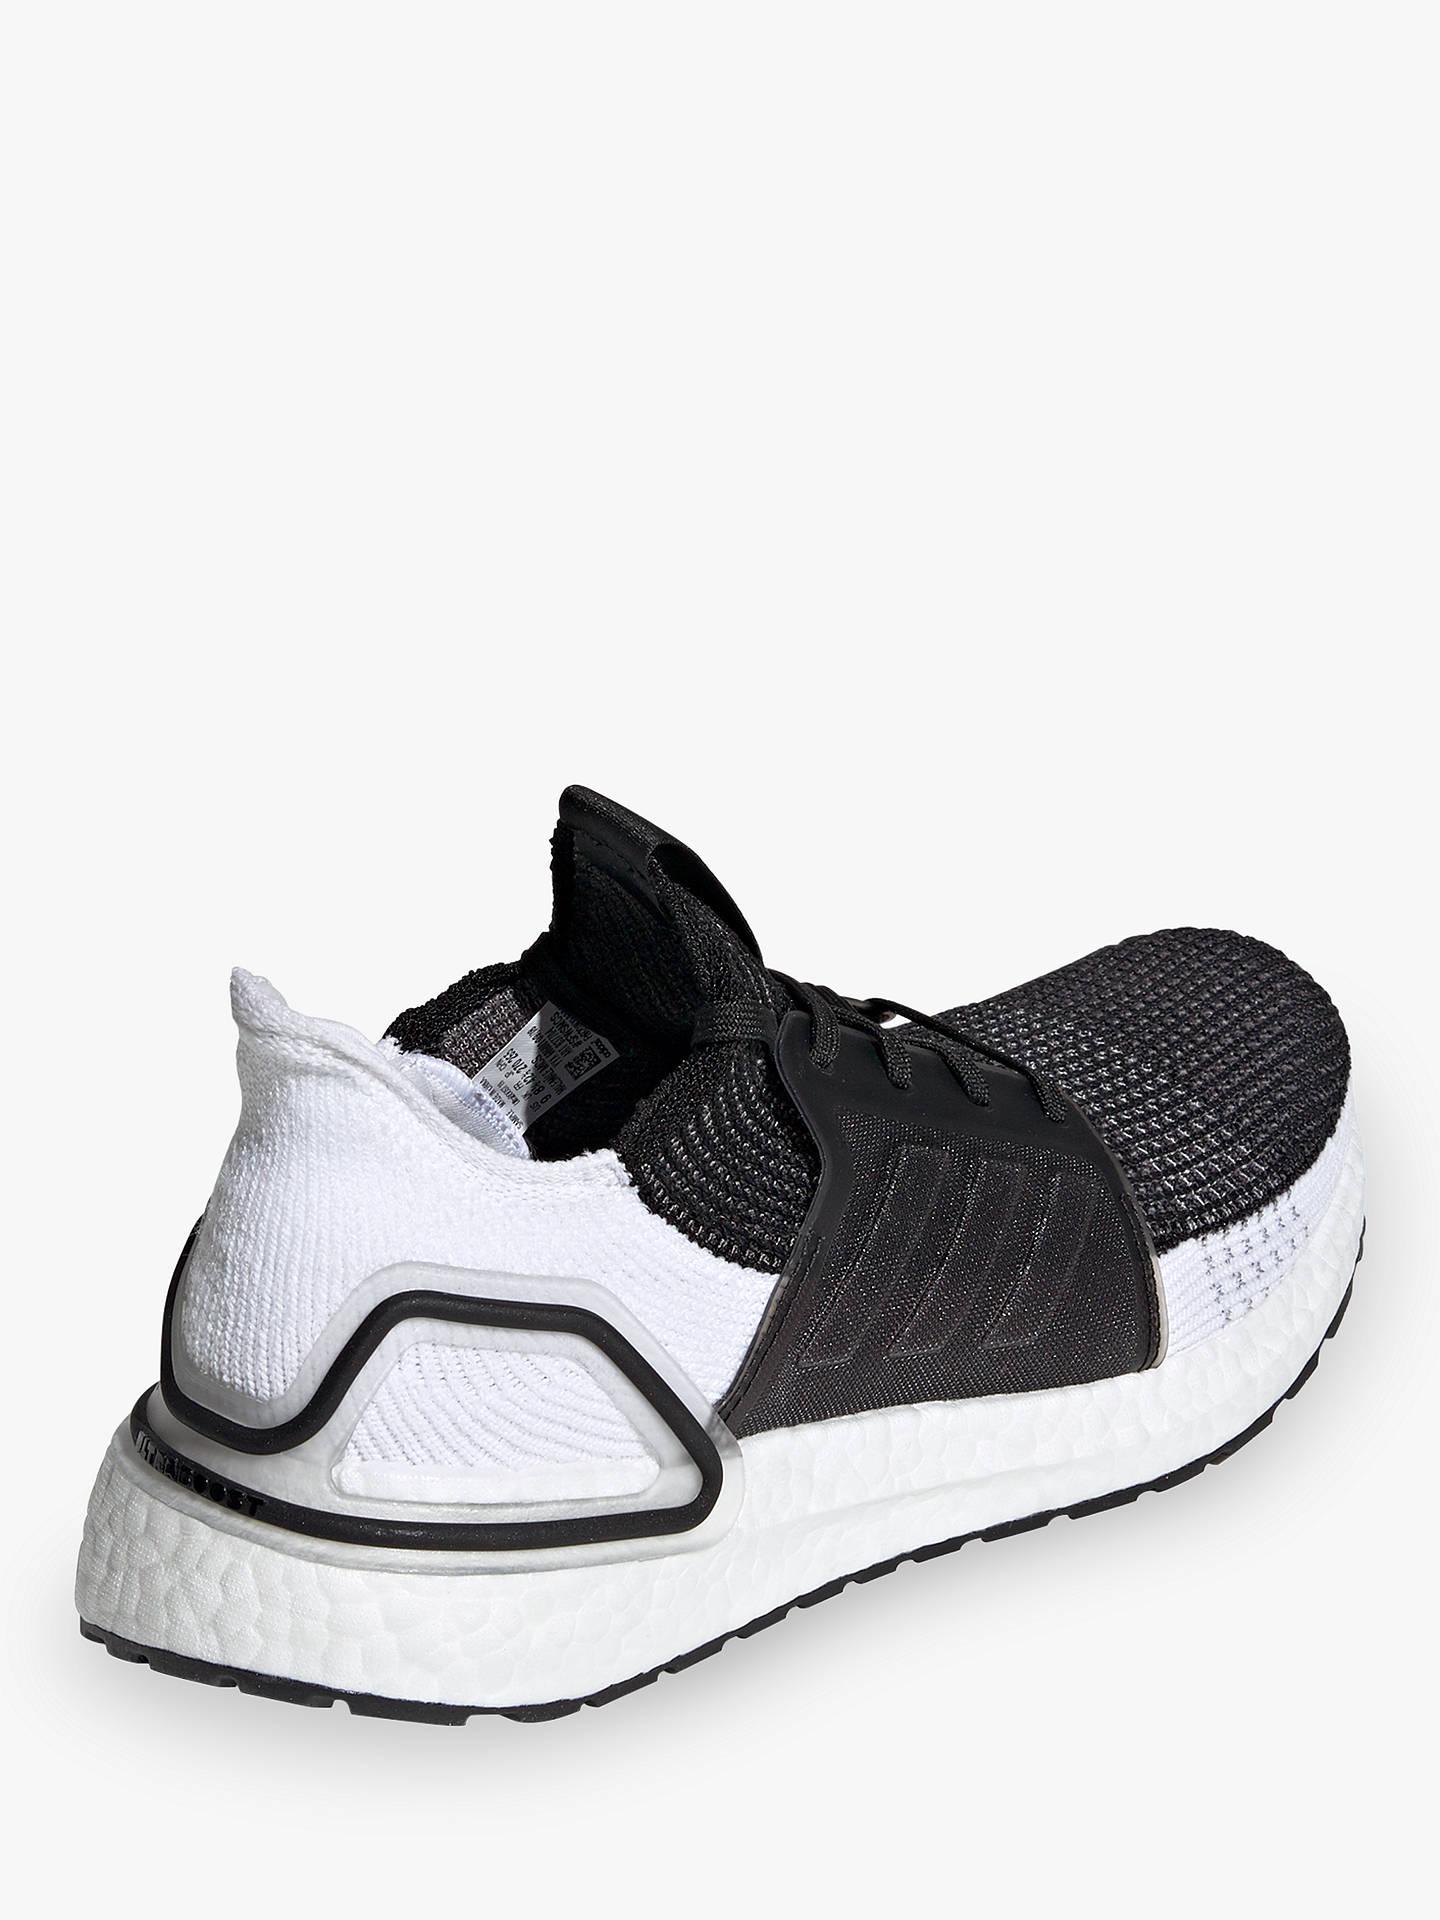 adidas UltraBOOST 19 Men's Running Shoes, Core BlackGrey